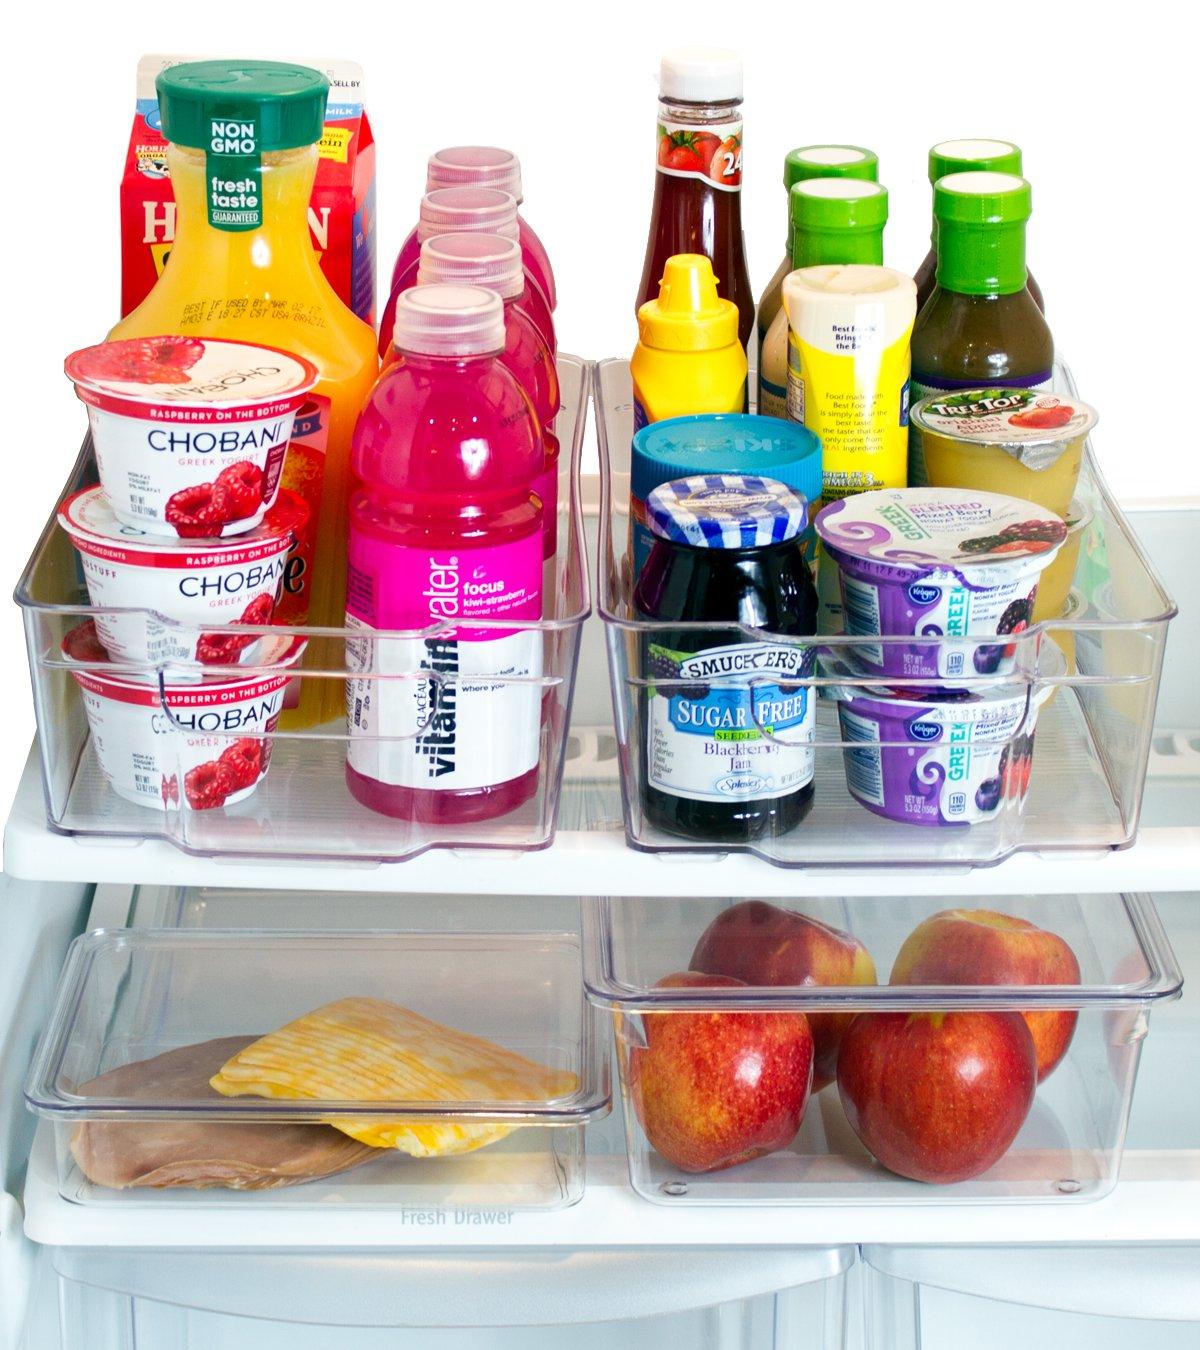 Misc Home [Premium] Refrigerator Organizer Bins – 2 Large Stackable Fridge Organizer Bins with Handles and 2 Nesting Fridge Bins w/Lids – For Fridge Freezer and Kitchen Pantry Organizer Bins